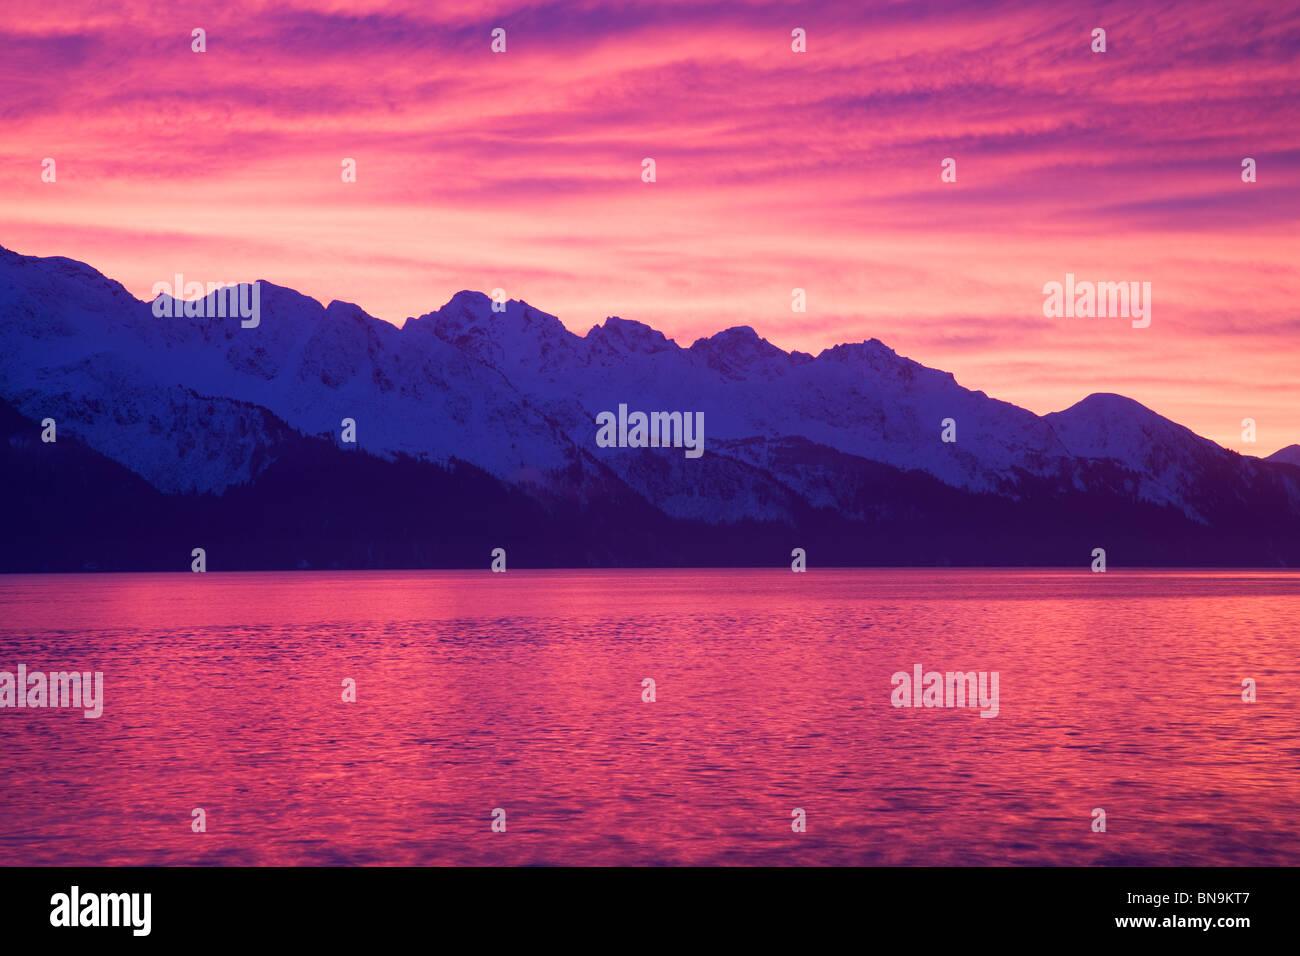 Sunrise over Resurrection Bay, Seward, Alaska. - Stock Image